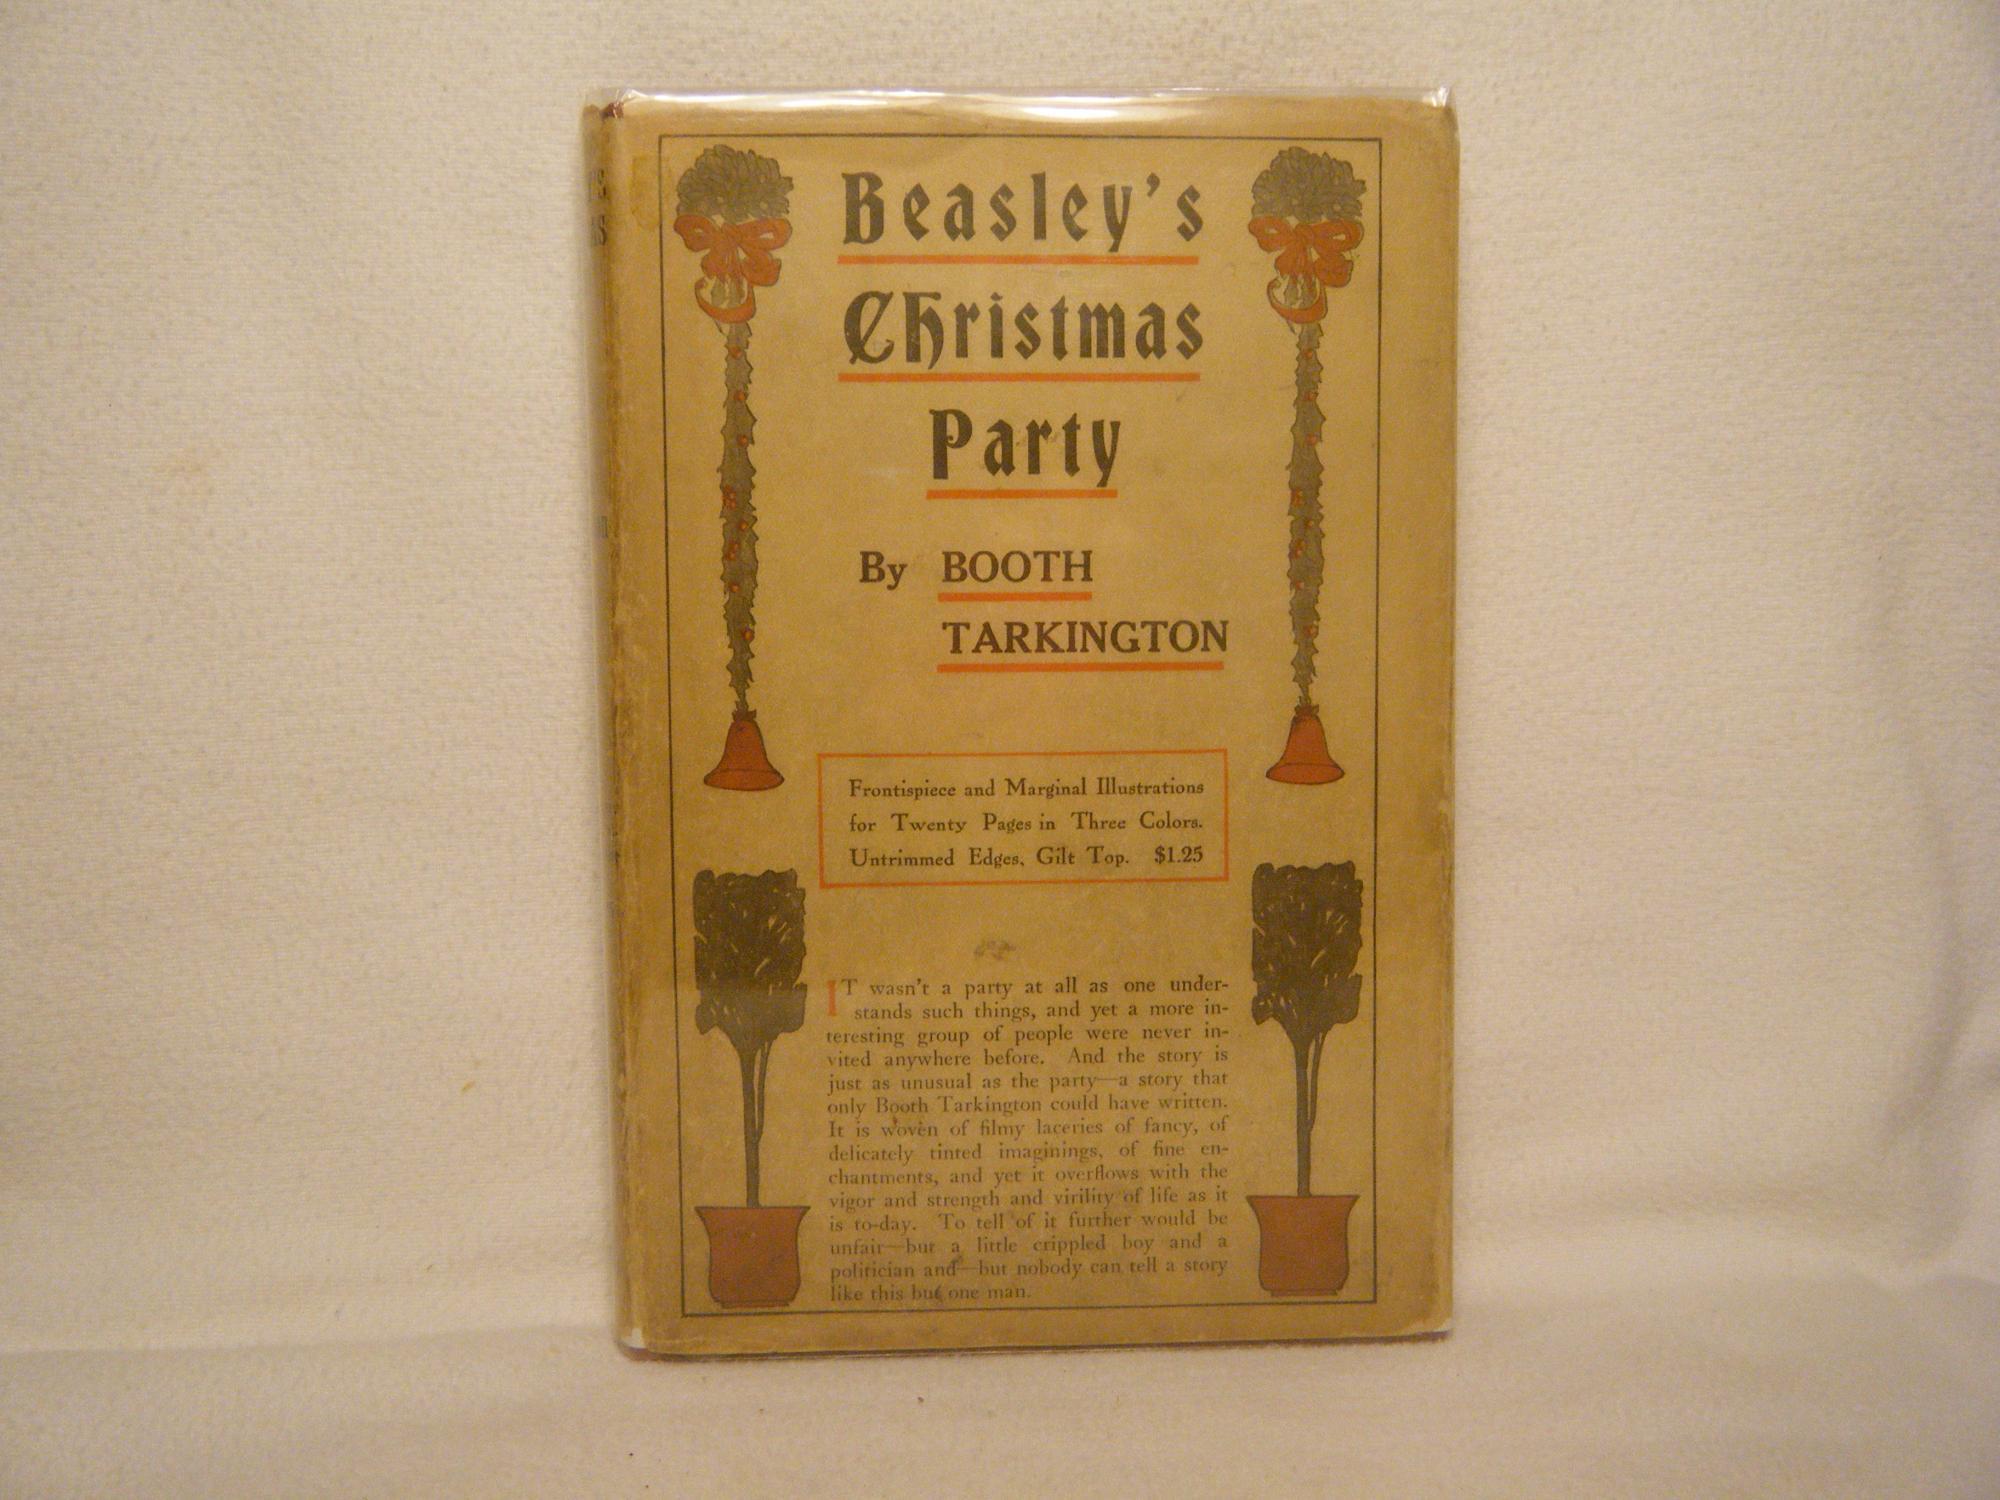 Mr. Beasley's Christmas Party Tarkington, Booth Very Good Hardcover